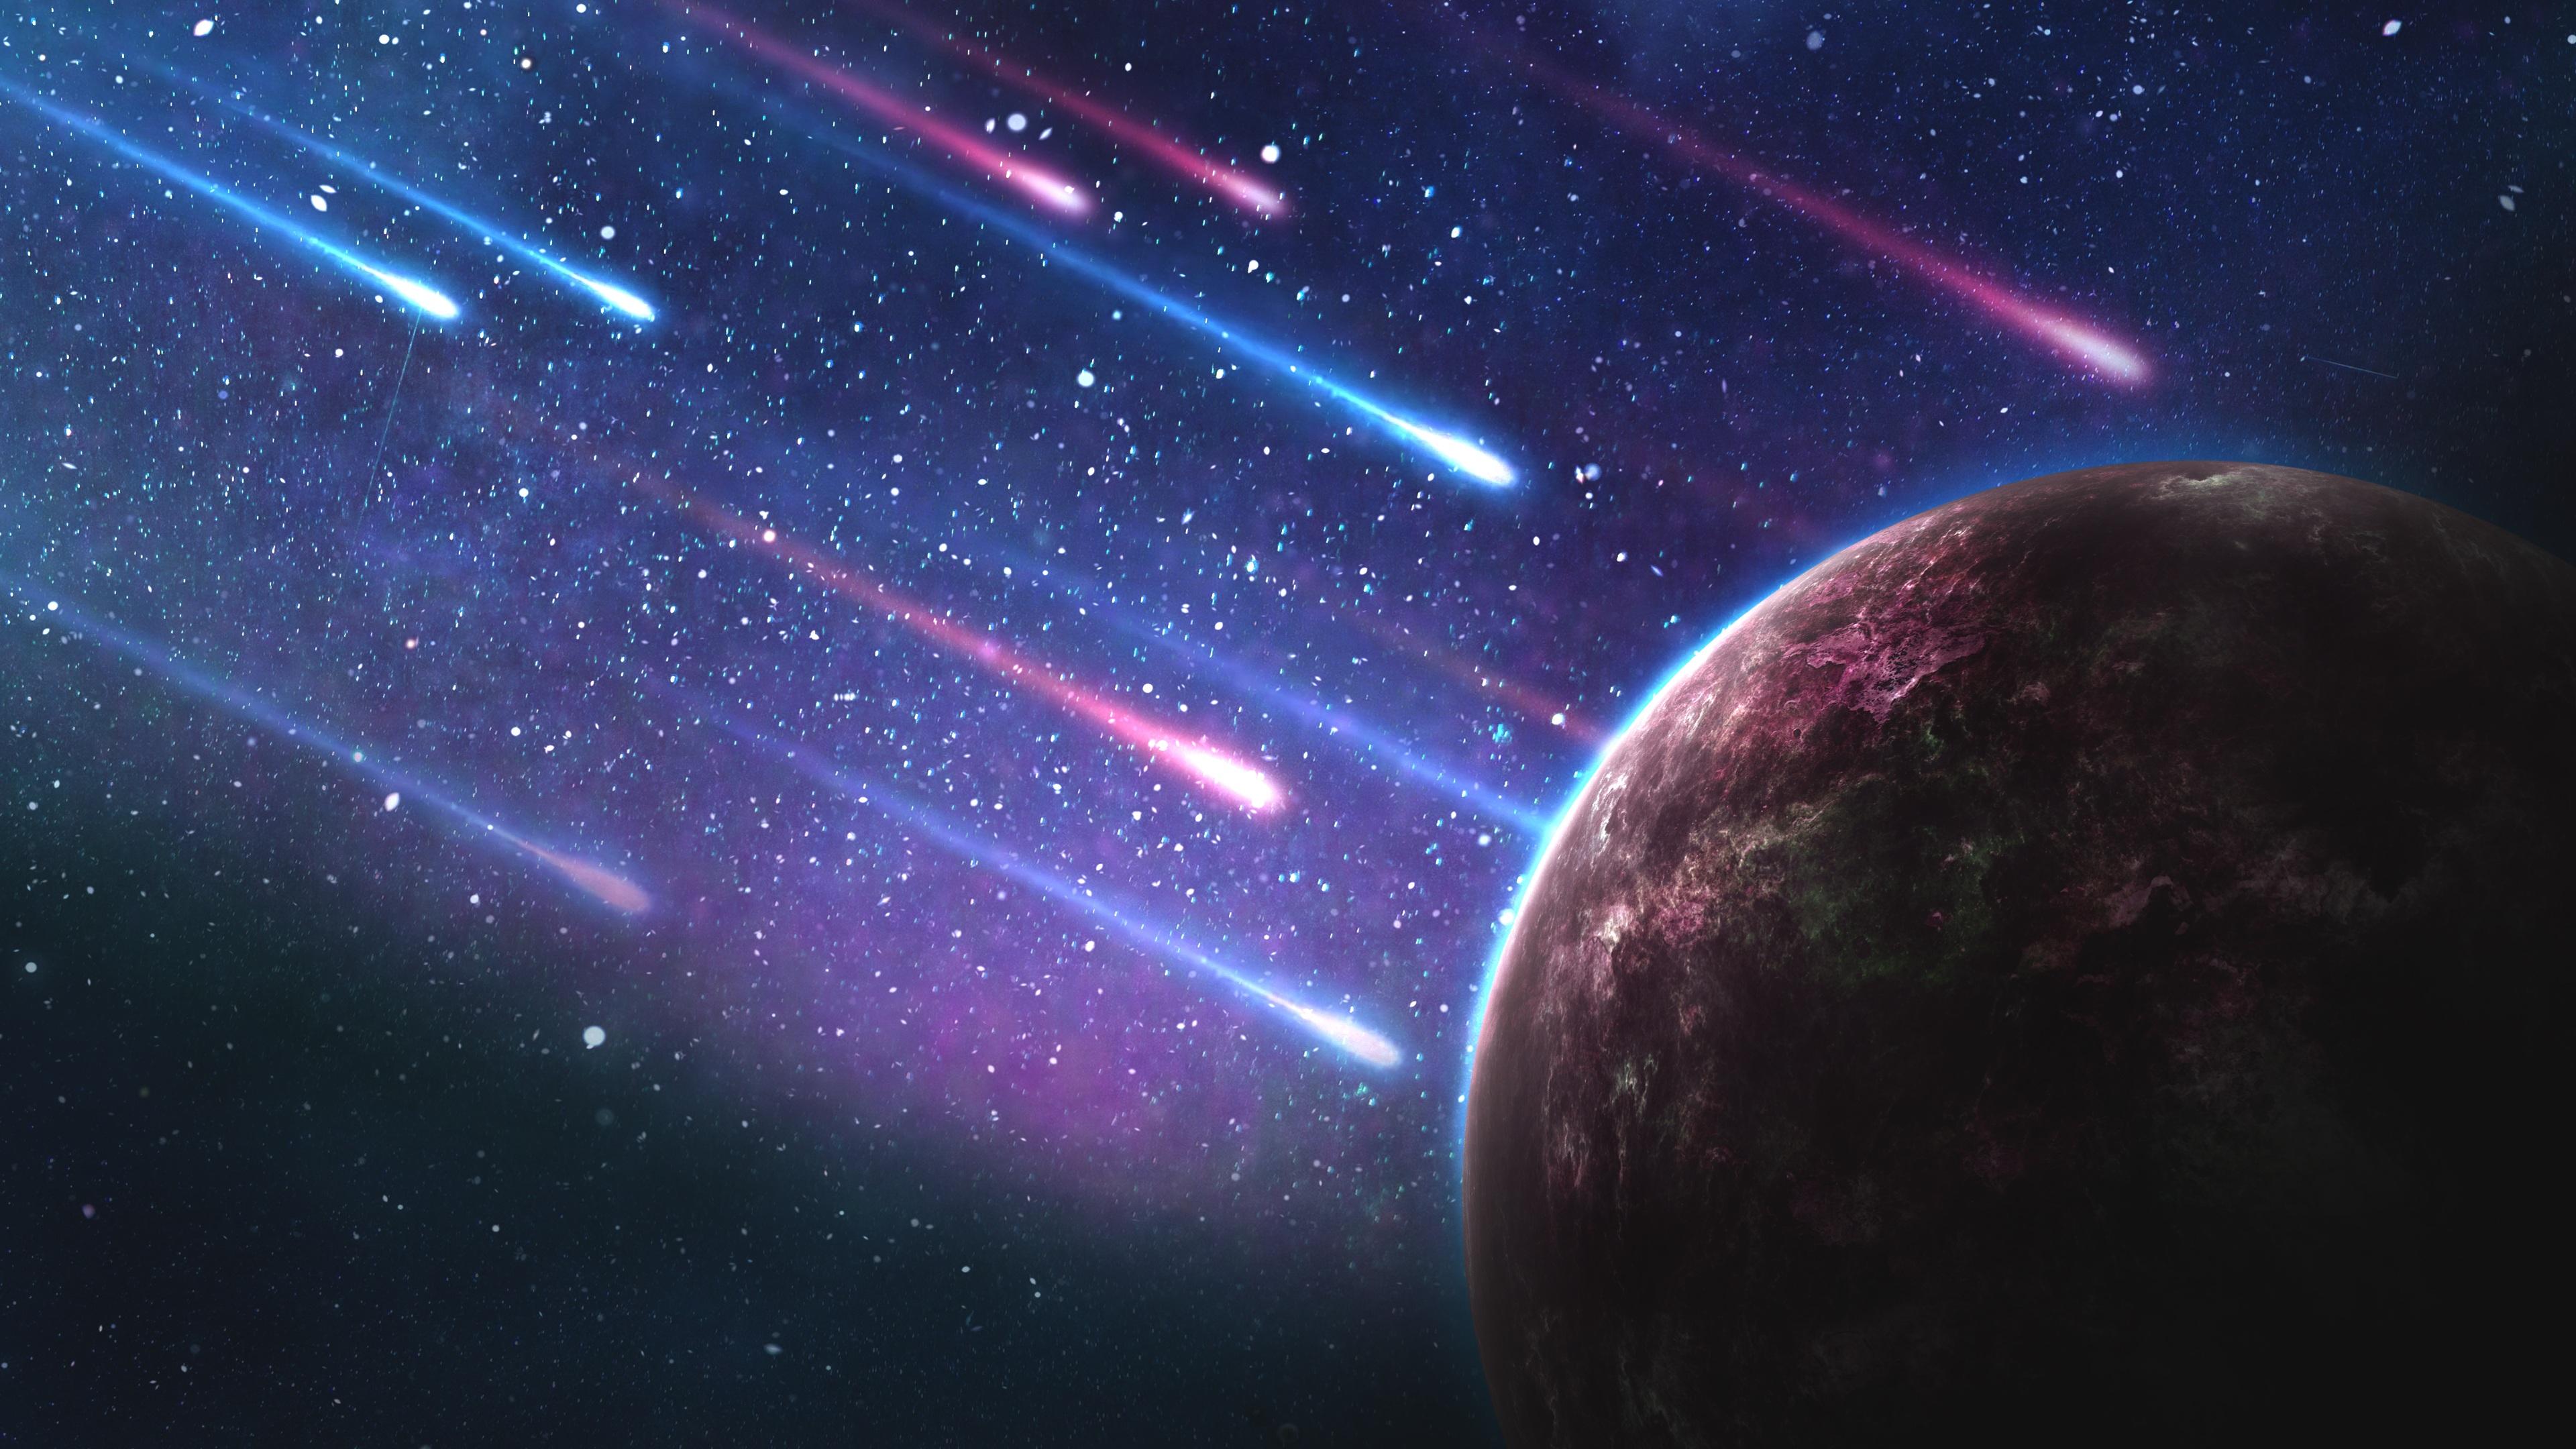 Desktop Wallpaper Planet Meteorites 4k Space Hd Image Picture Background Cbf1c9